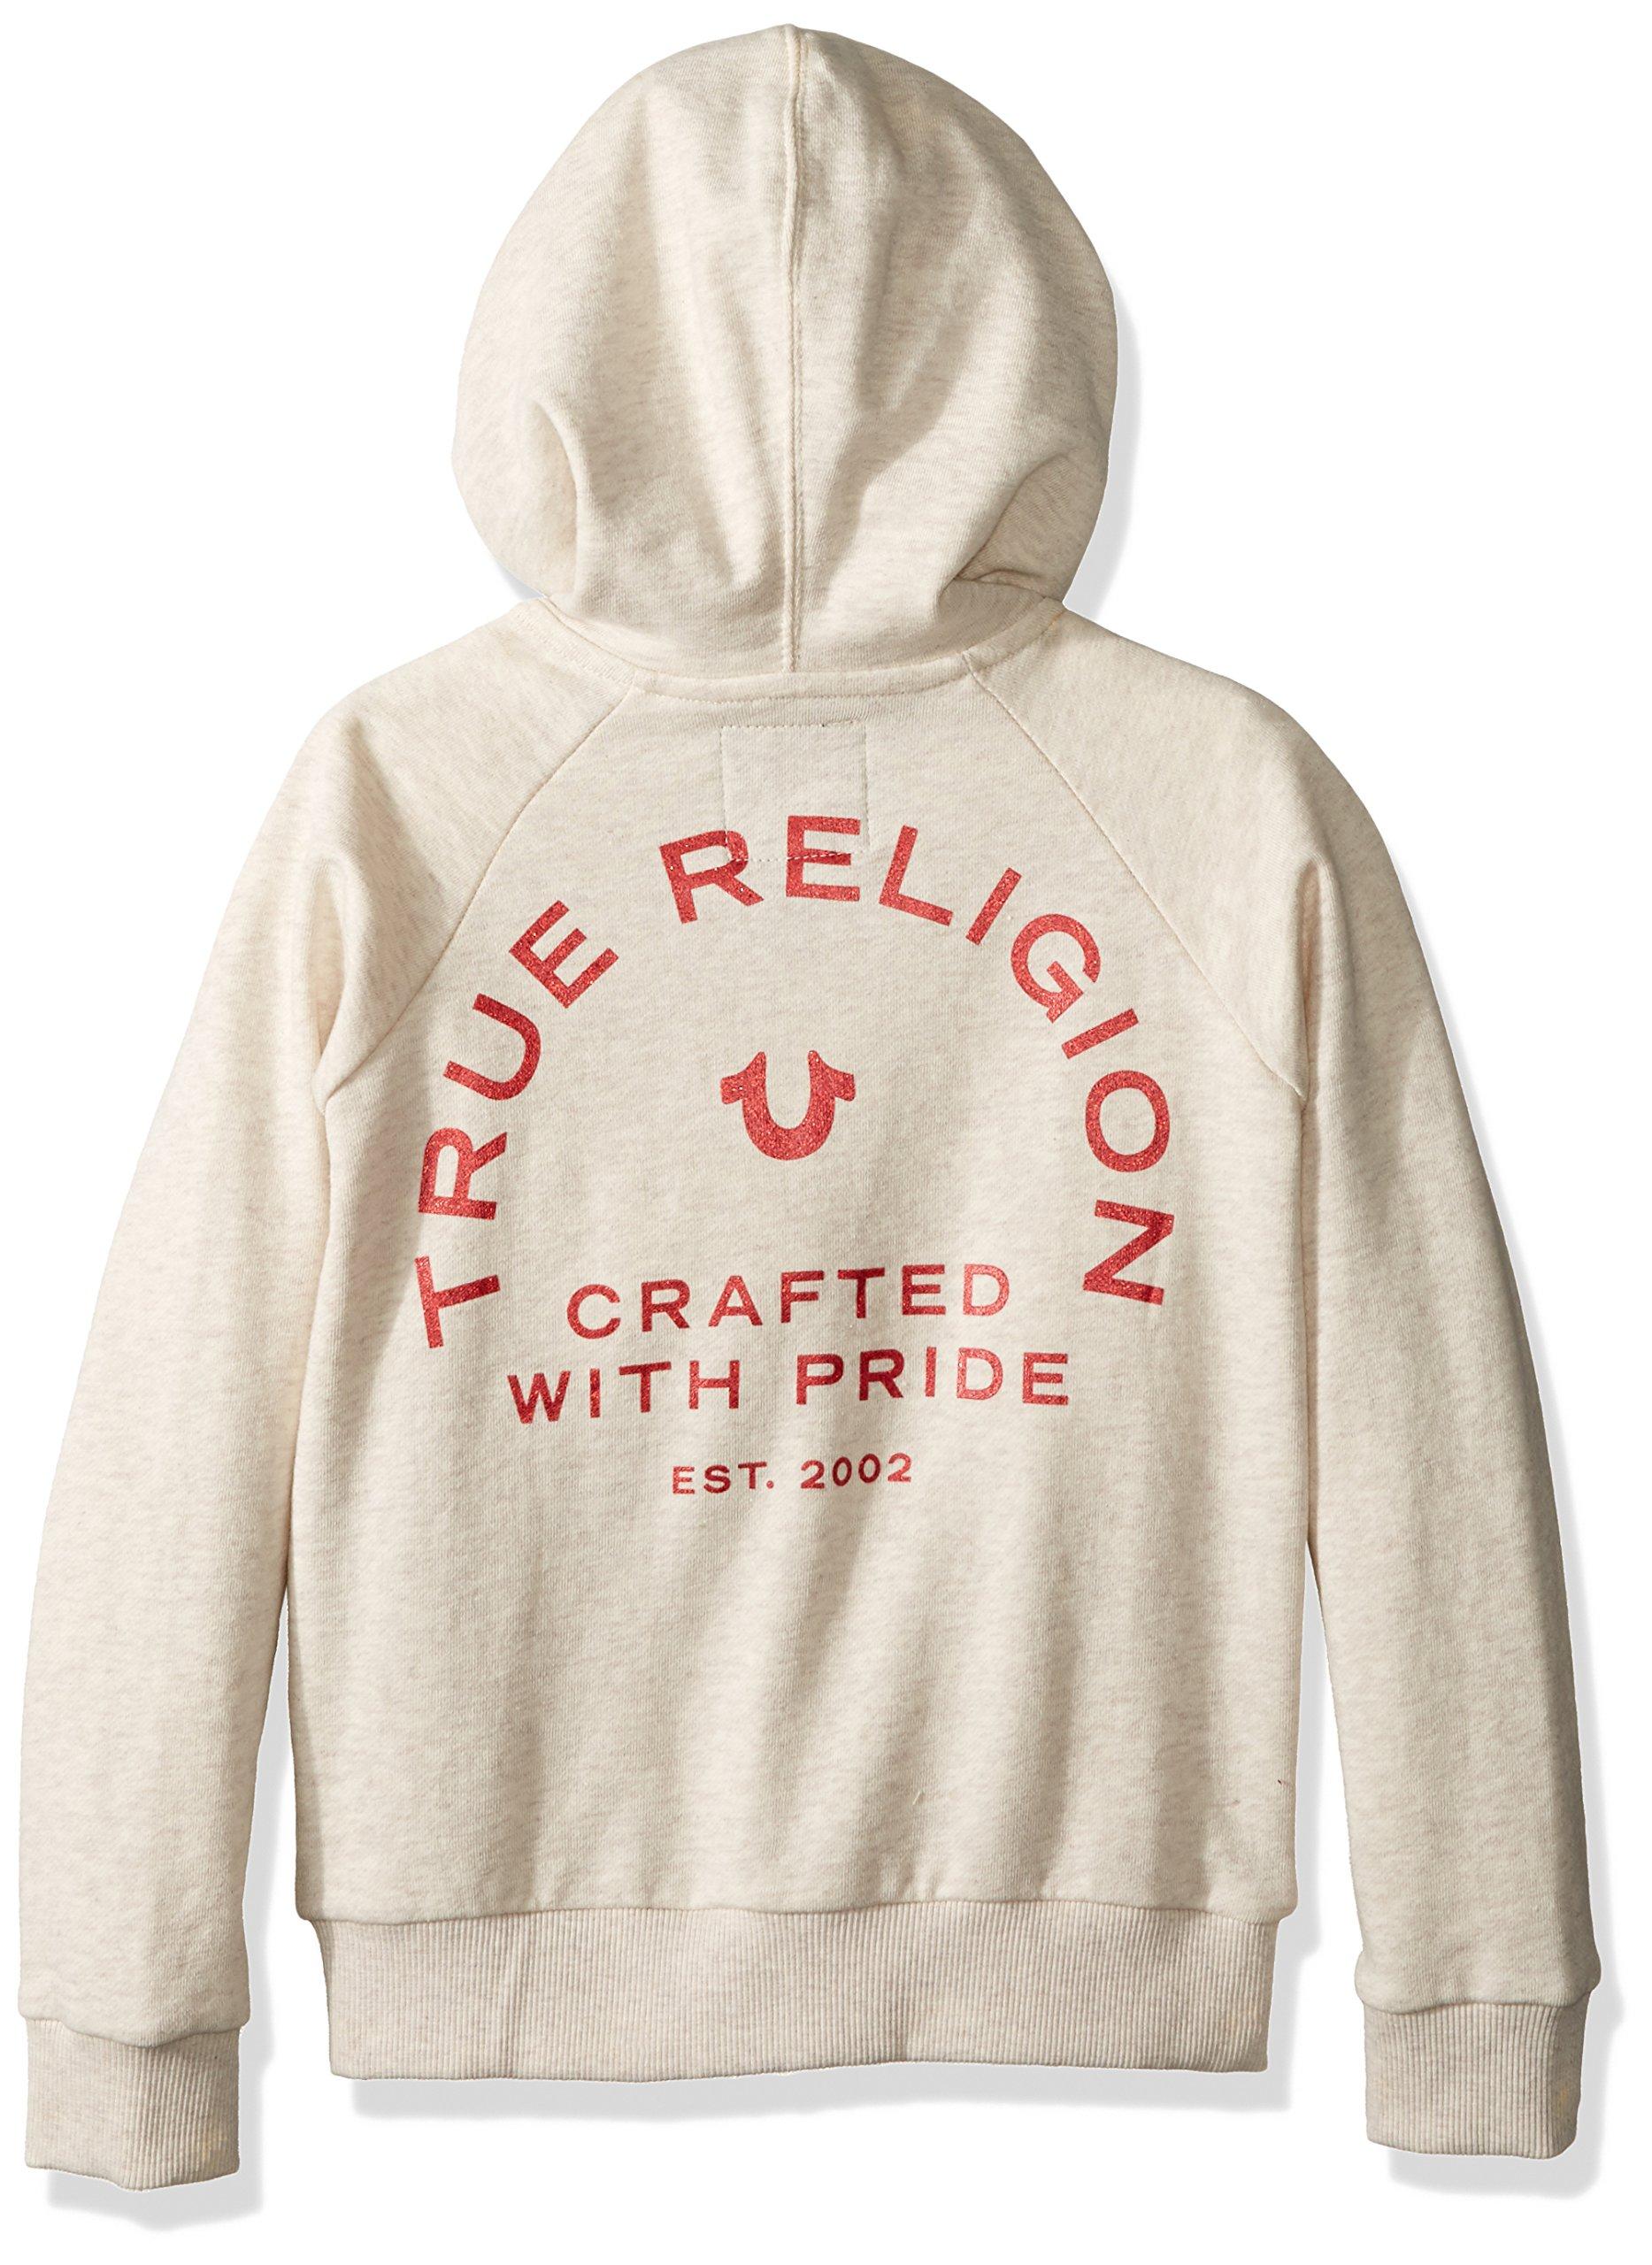 True Religion Girls' Logo Hoodie, Oatmeal, 5 by True Religion (Image #2)